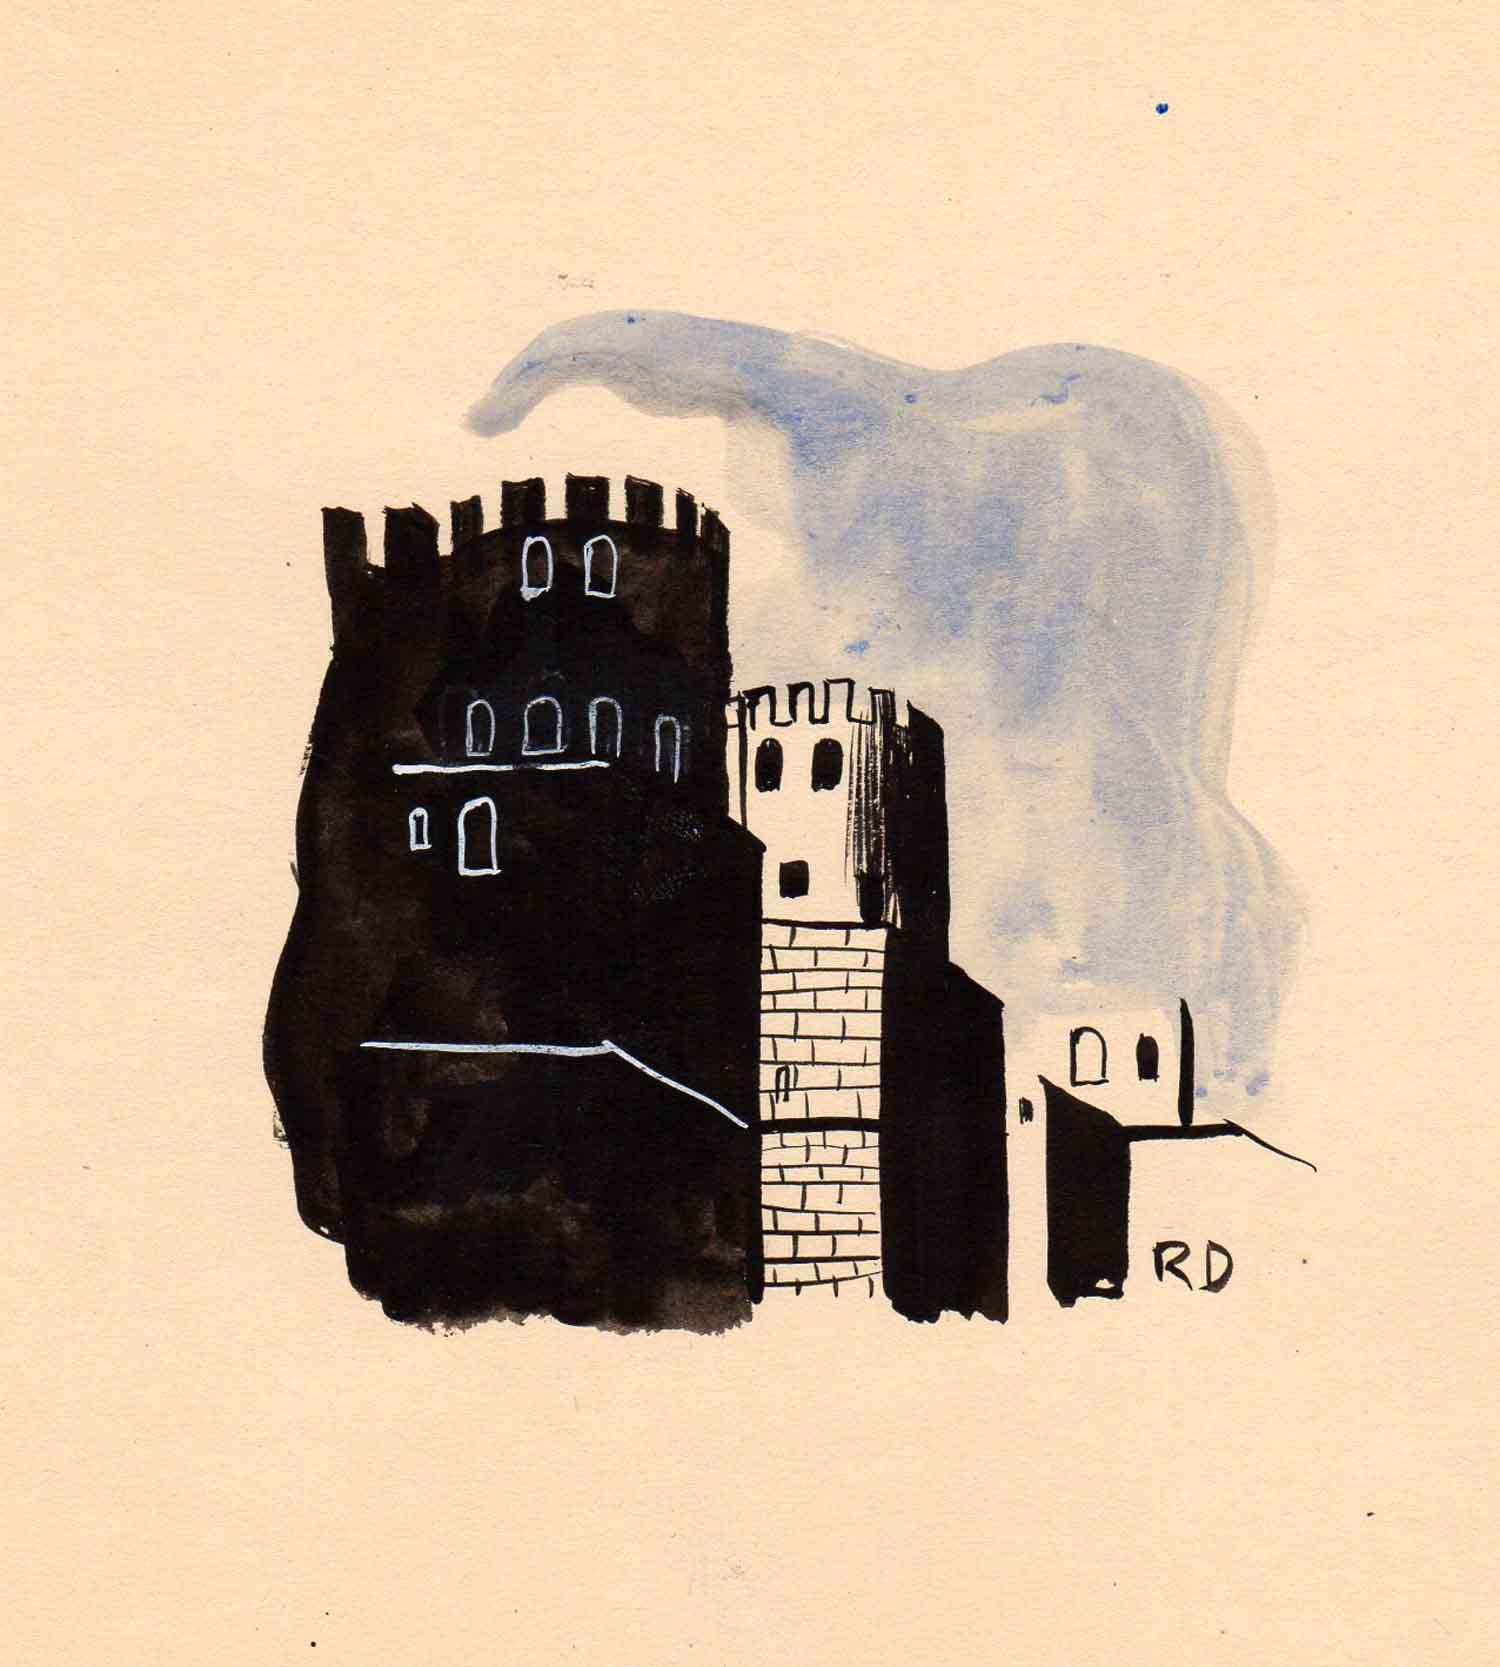 Roger Duvoisin | Roger Duvoisin | Porte de St Sébastien